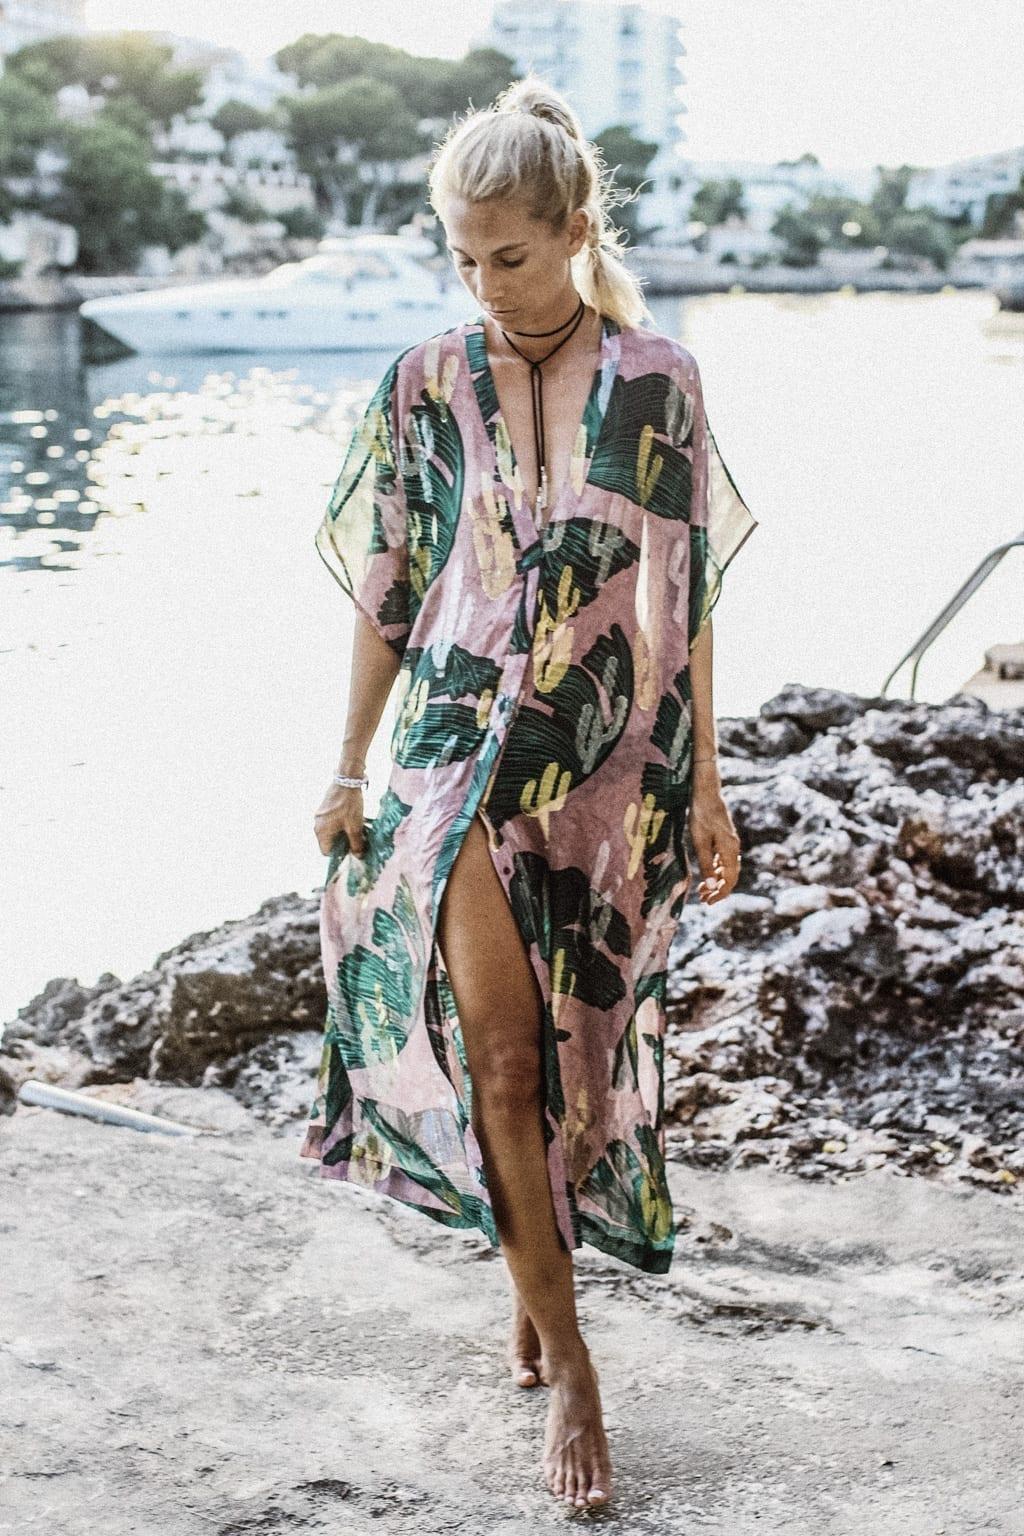 CK-1606-Mallorca-Island-Spain-Luxury-Holiday-Blogger-Beach-Outfit-Style-Fashion-Baleares-1312